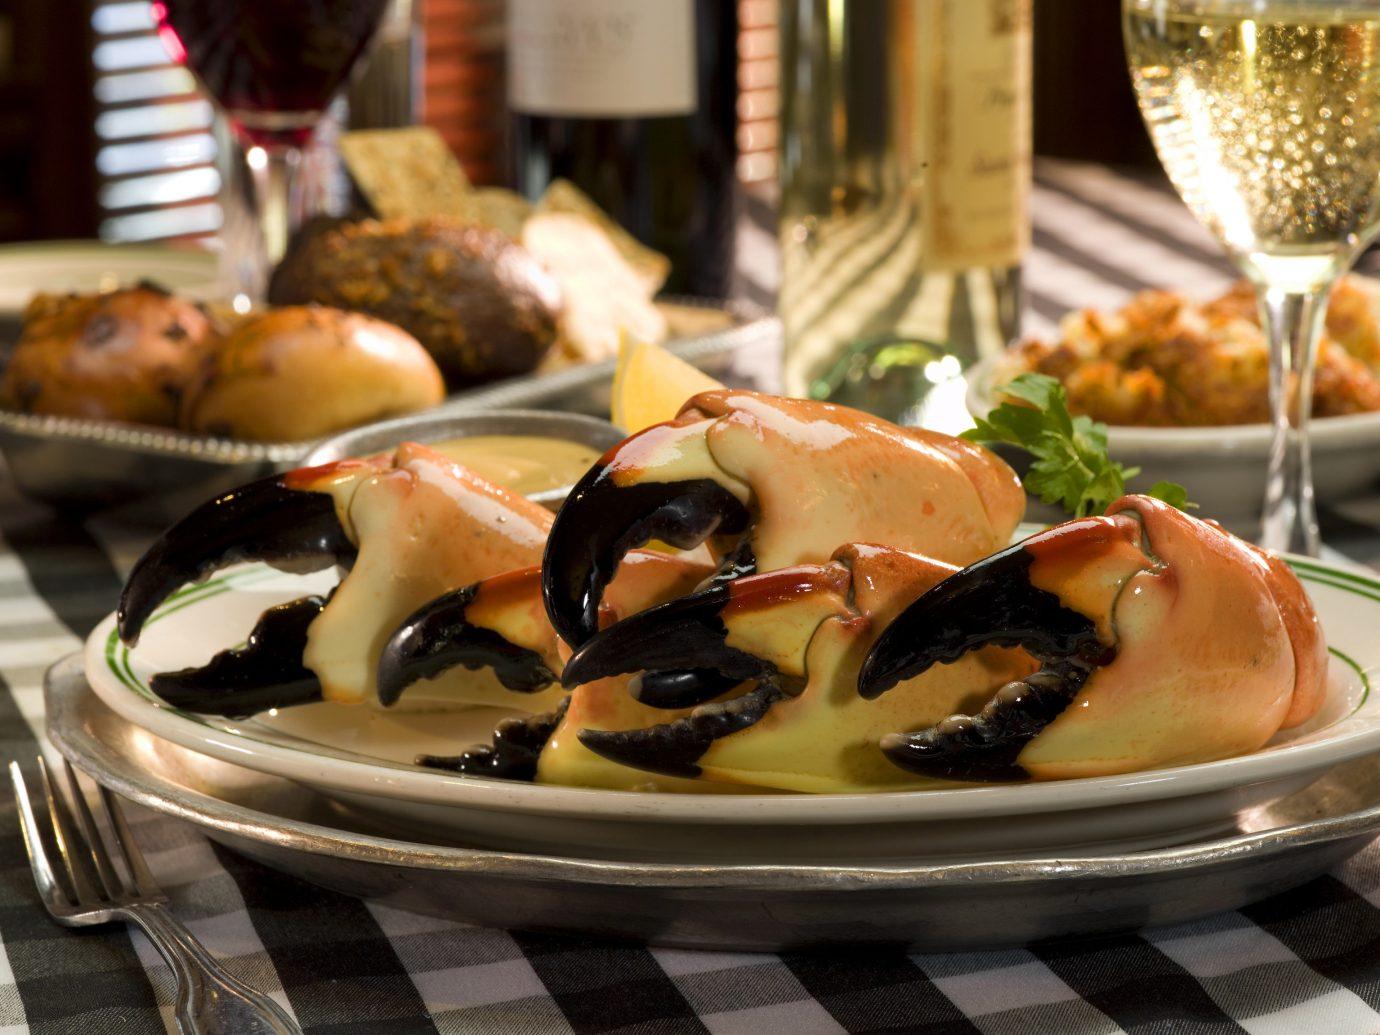 Food + Drink plate table food indoor dish cuisine mussel Seafood appetizer animal source foods brunch breakfast meal recipe